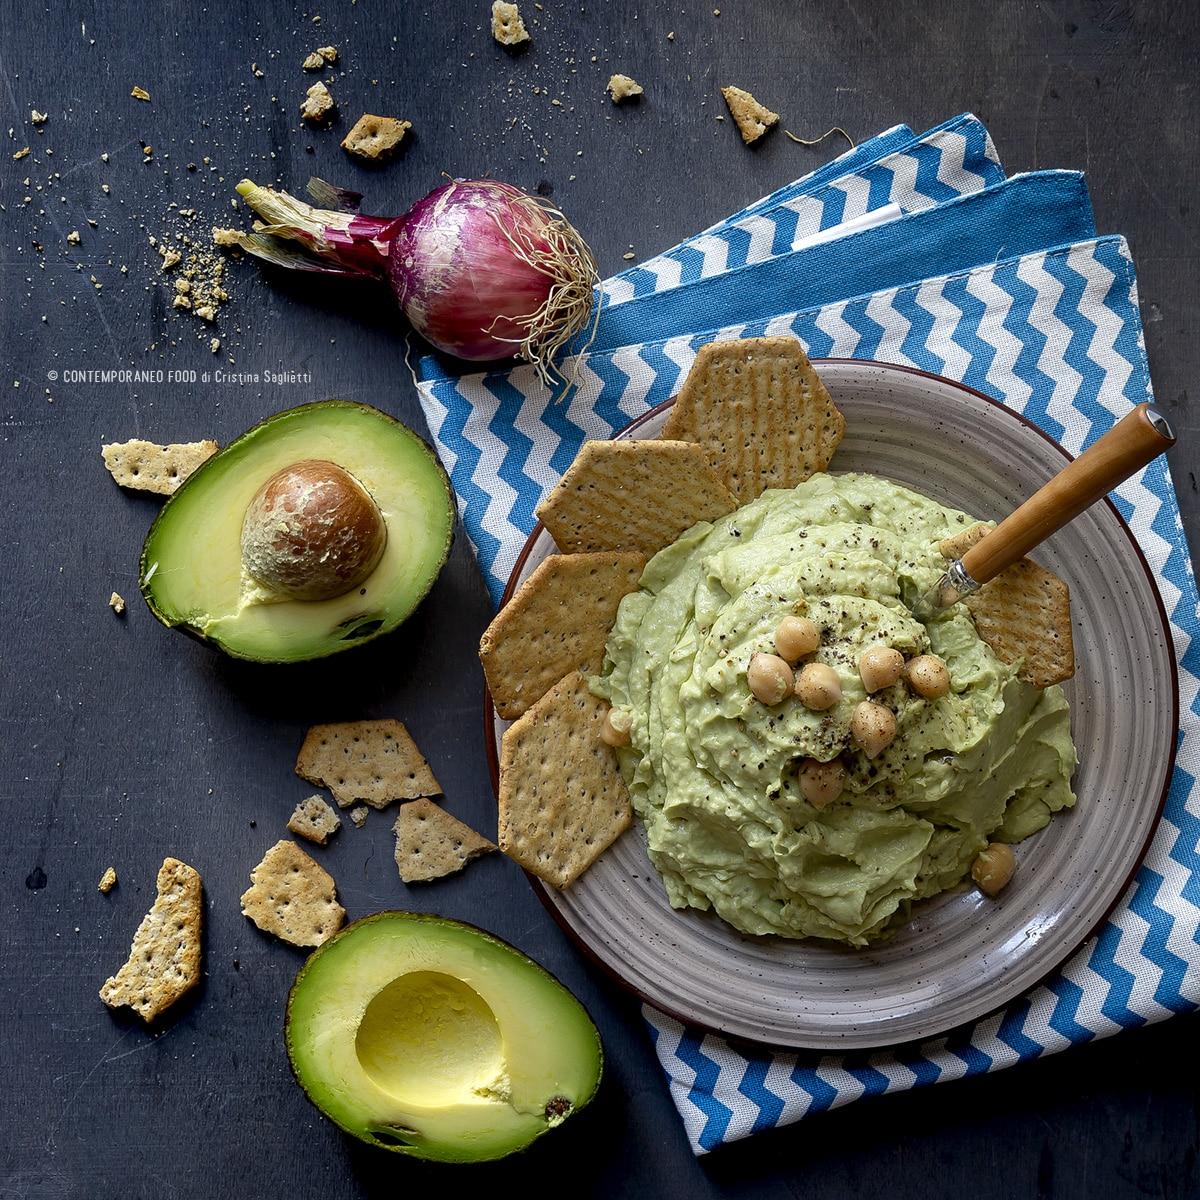 hummus-avocado-ricetta-light-dieta-facile-contemporaneo-food